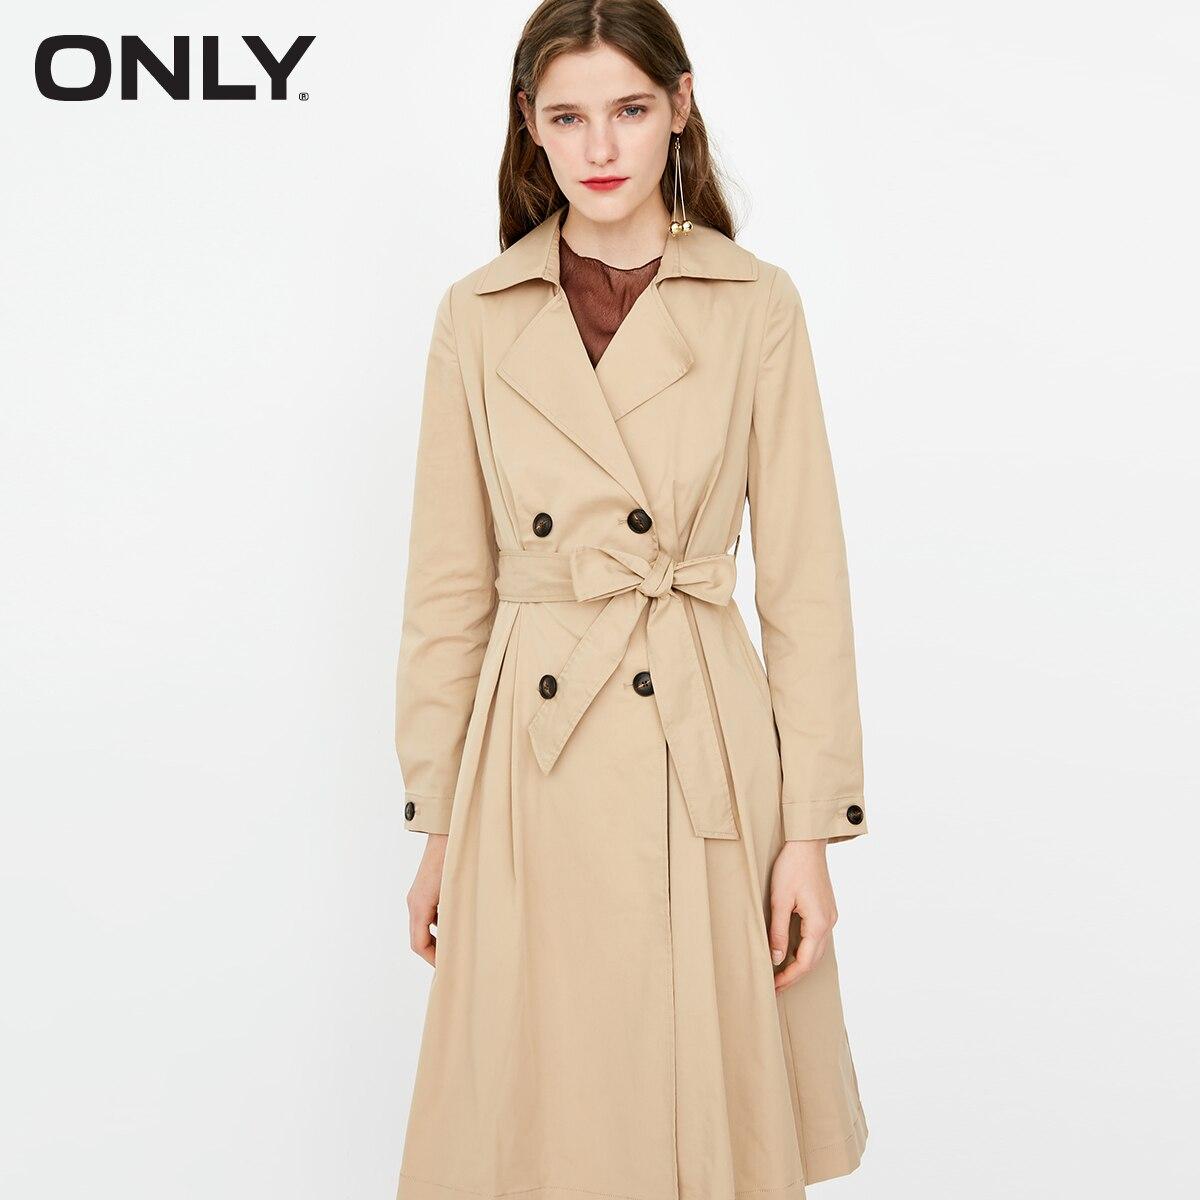 Sólo otoño nueva mujer Lapel Khaki medio cintura longitud viento abrigo   118336551